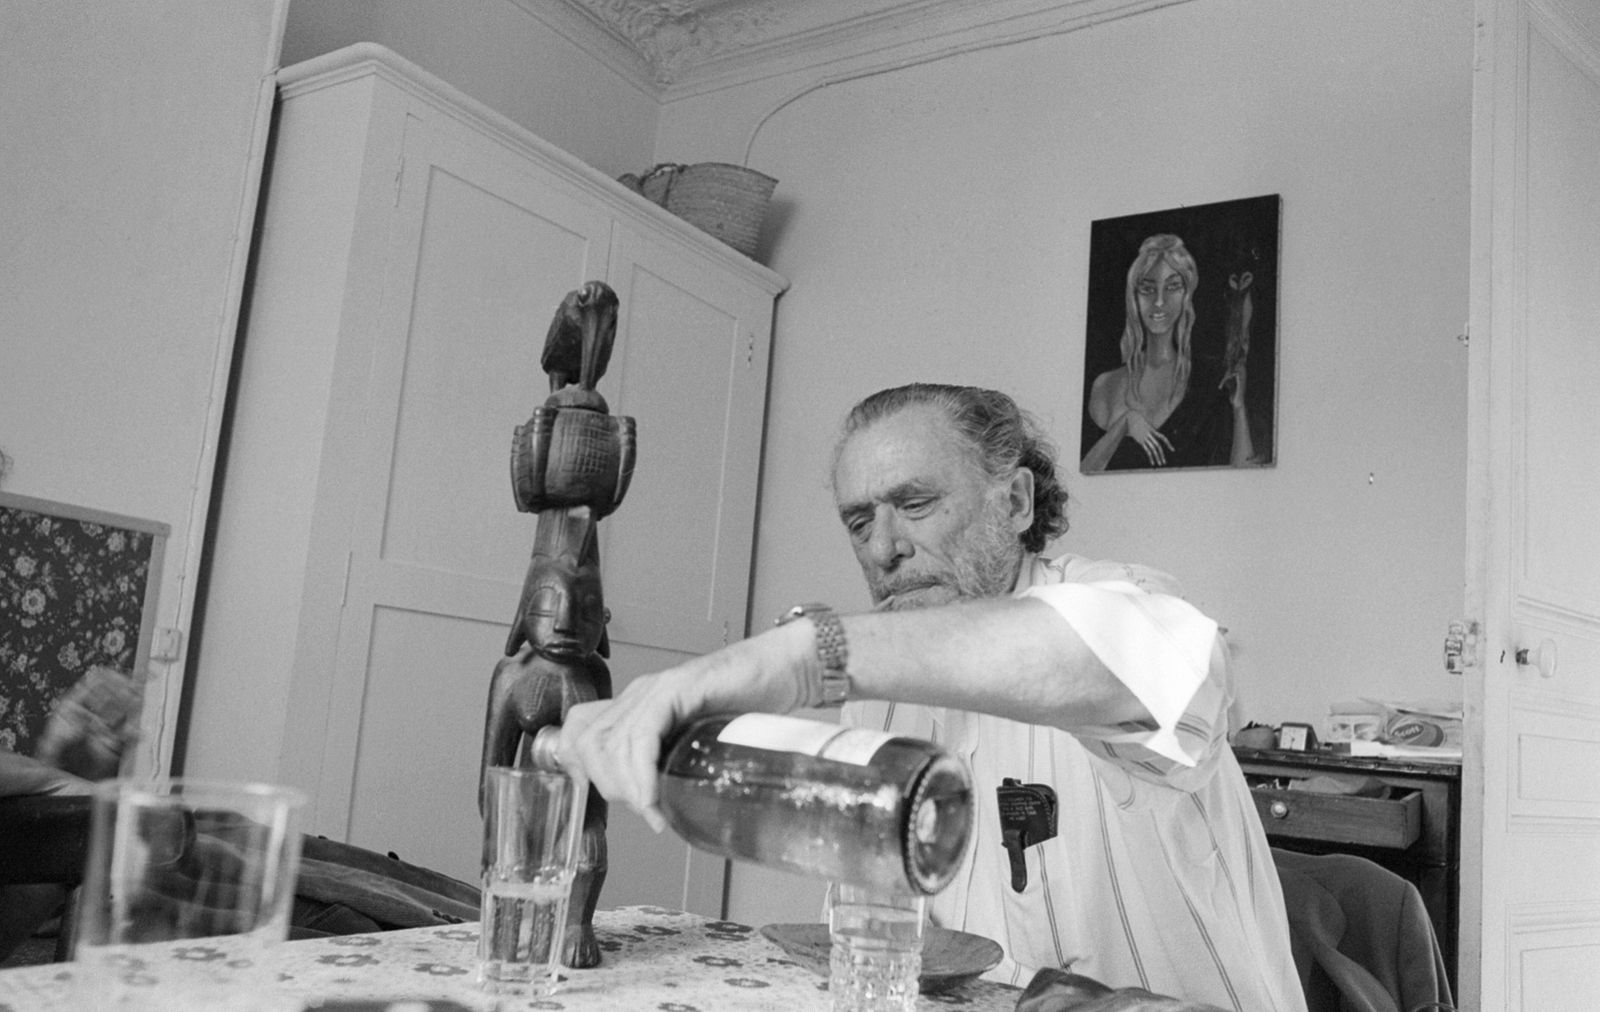 Portrait of Charles Bukowski, le 9 septembre 1978, San Pedro, Los Angeles, California, USA !AUFNAHMEDATUM GESCHÄTZT! PU